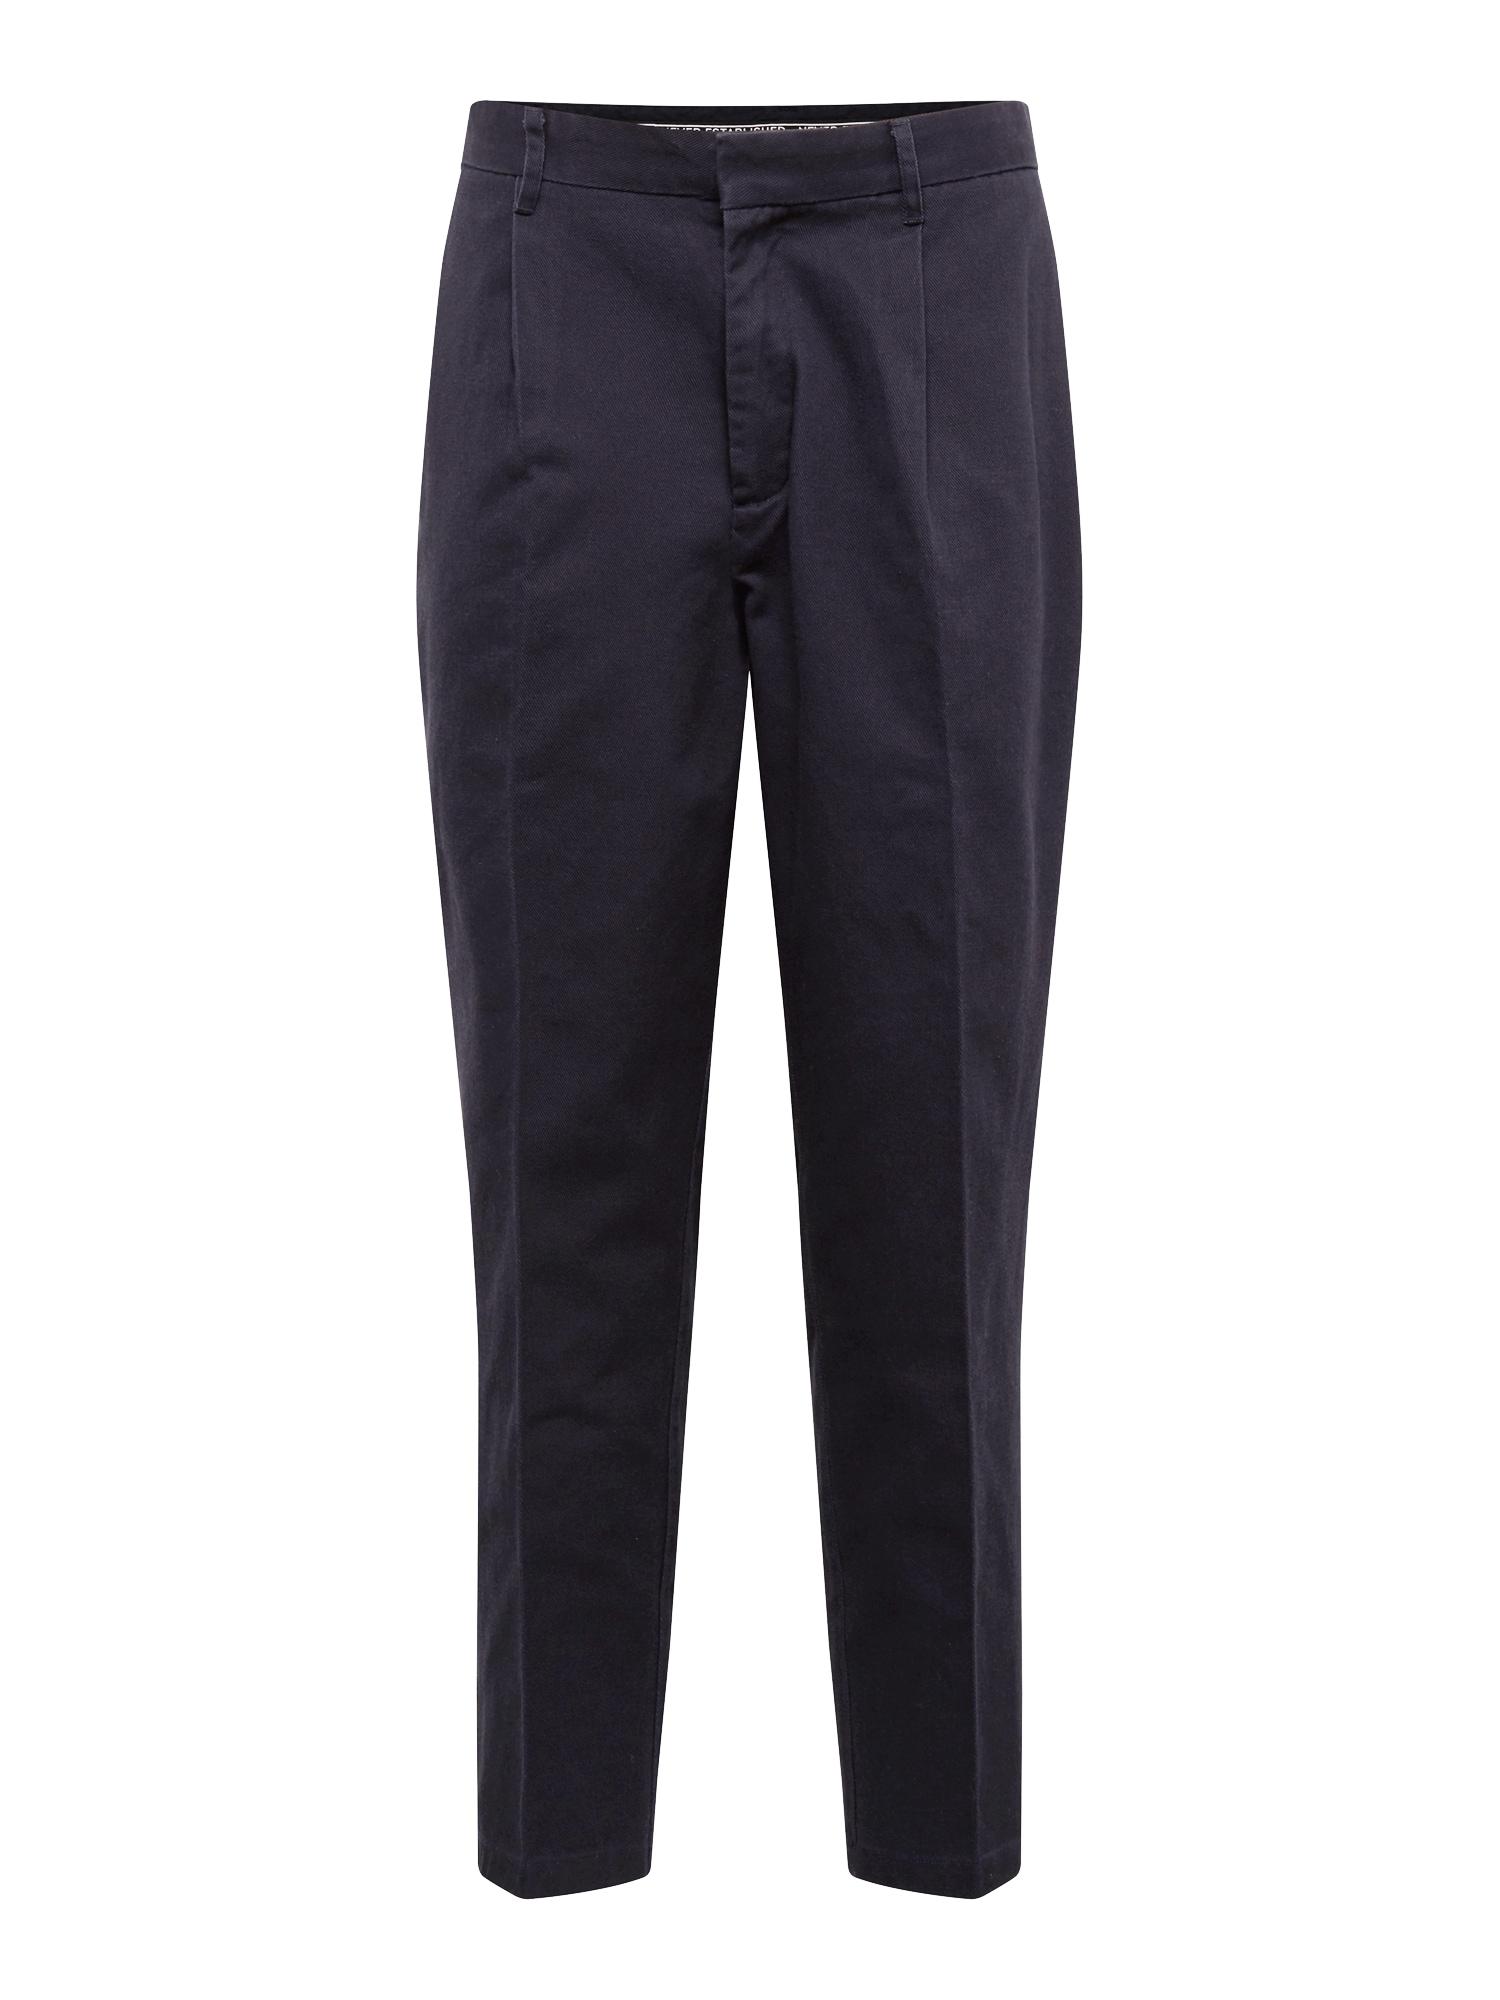 Kalhoty s puky WORKWEAR TWILL námořnická modř Review